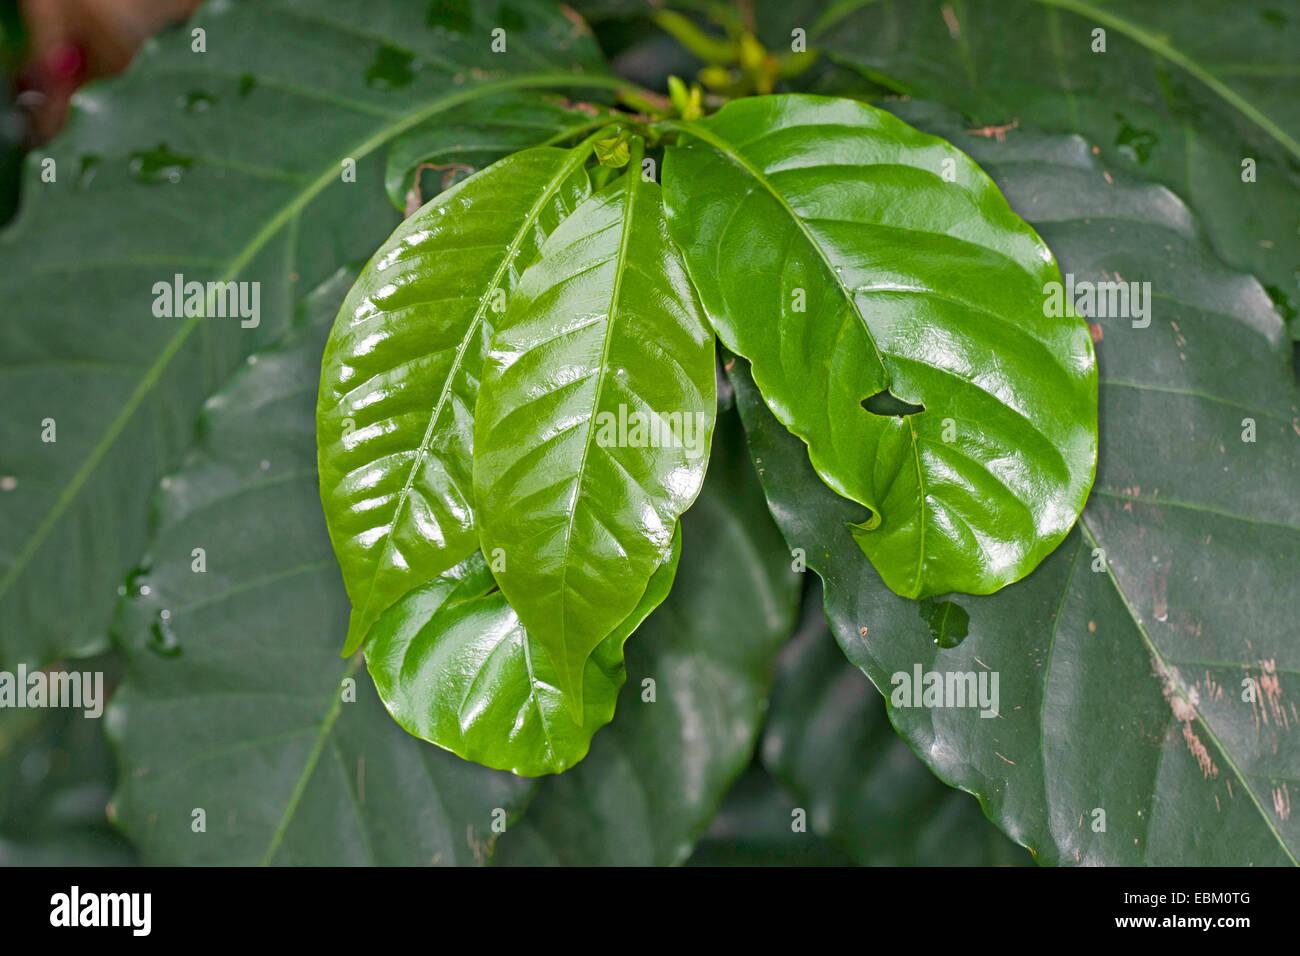 leaves coffea arabica stockfotos leaves coffea arabica bilder alamy. Black Bedroom Furniture Sets. Home Design Ideas